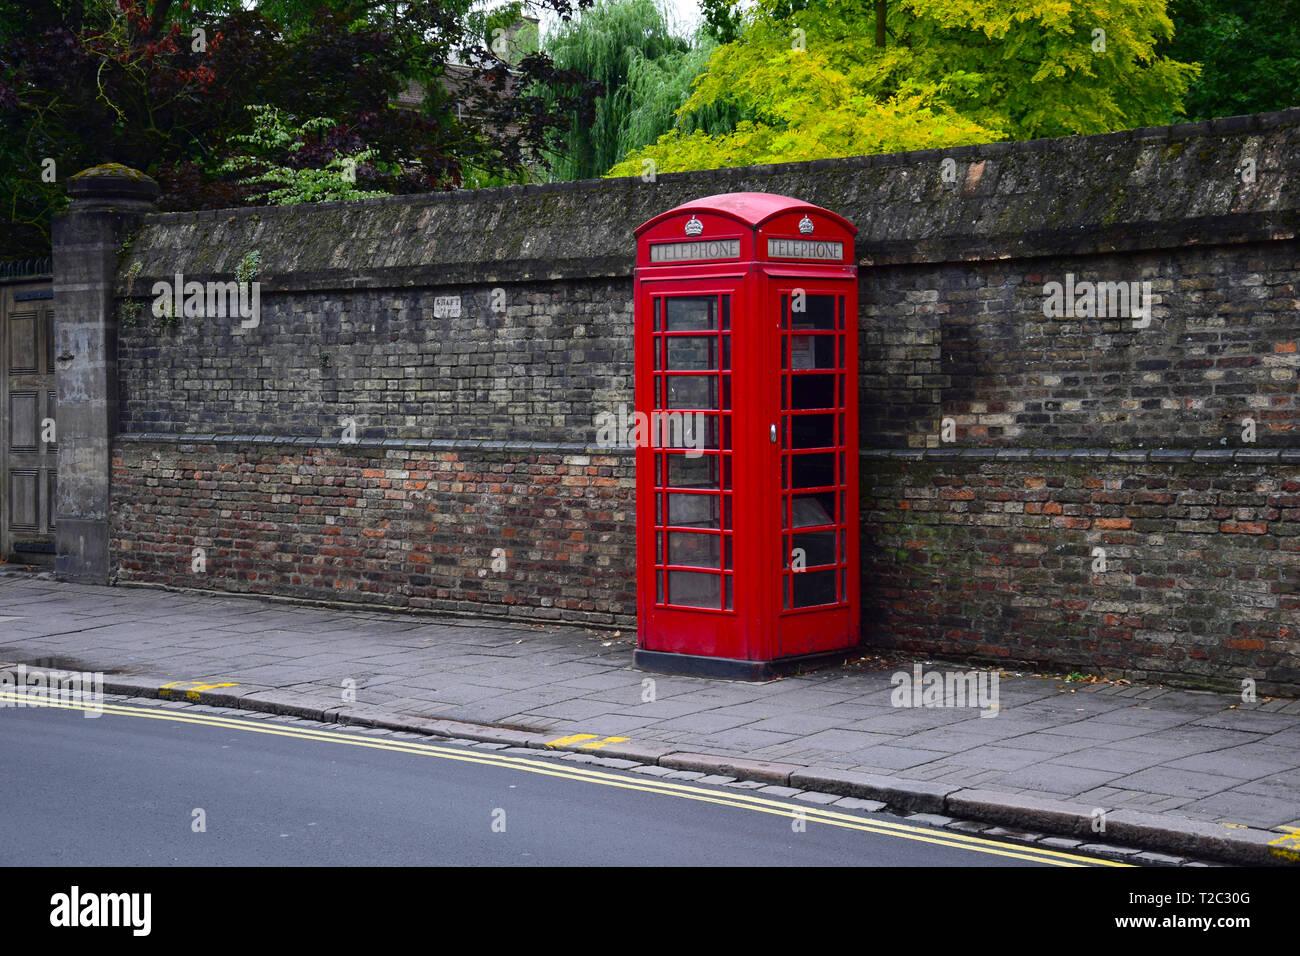 Telefonzelle in Cambridge, England, Großbritannien Stockbild